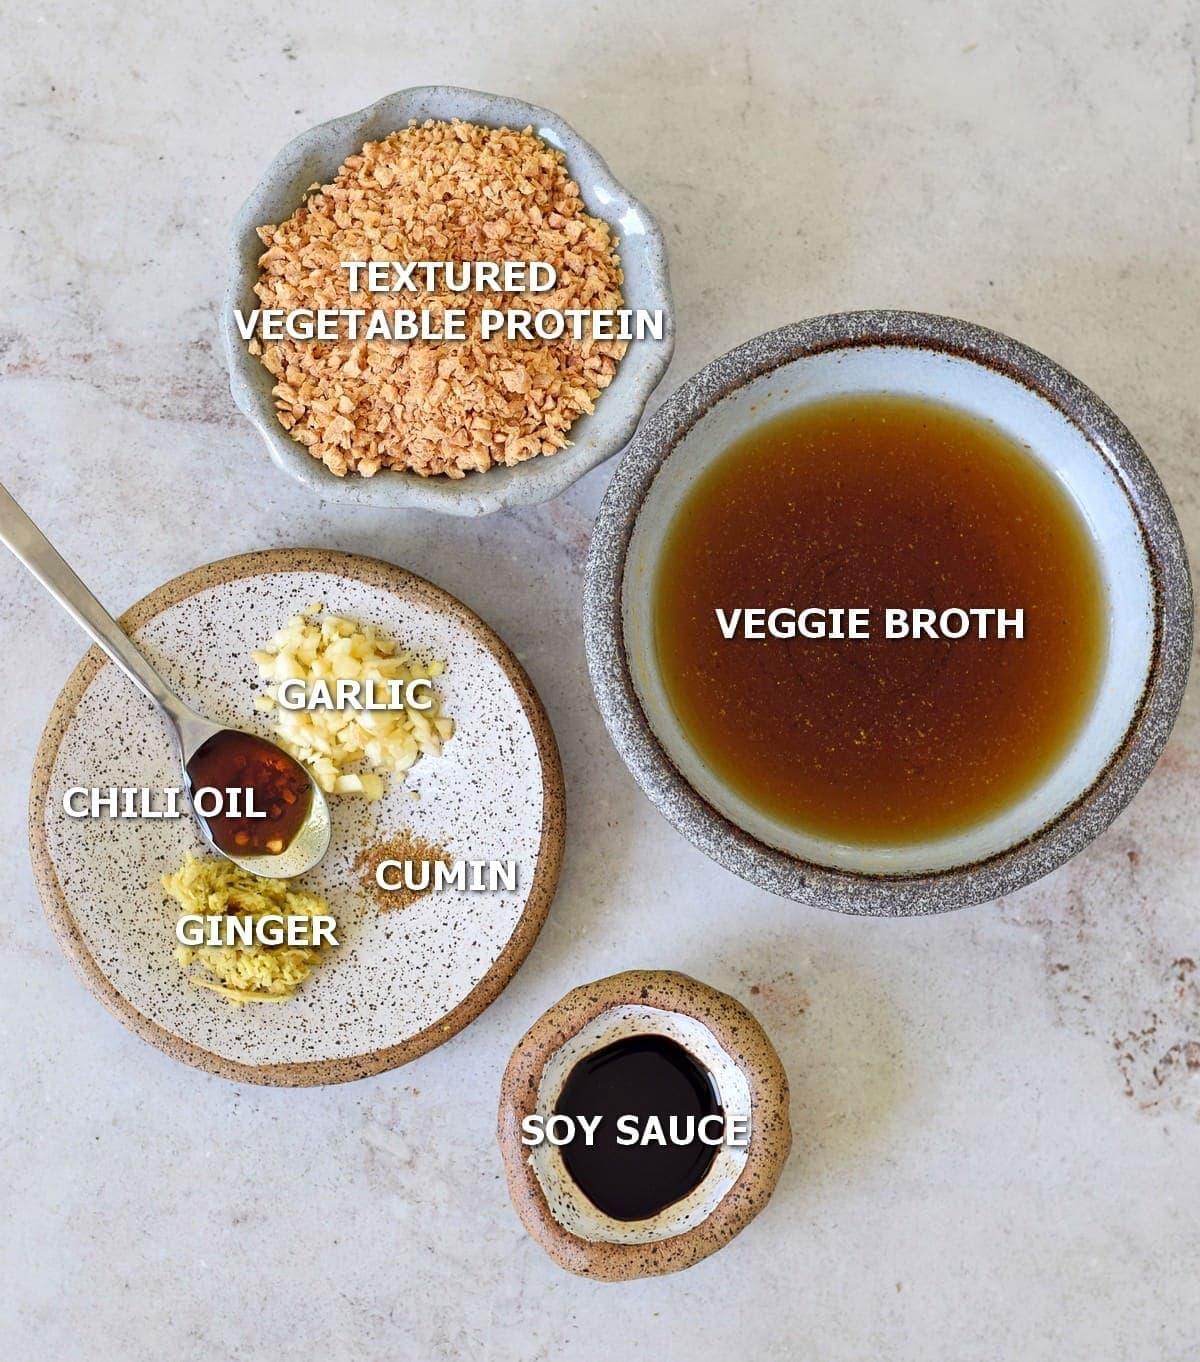 Ingredients for vegan mince